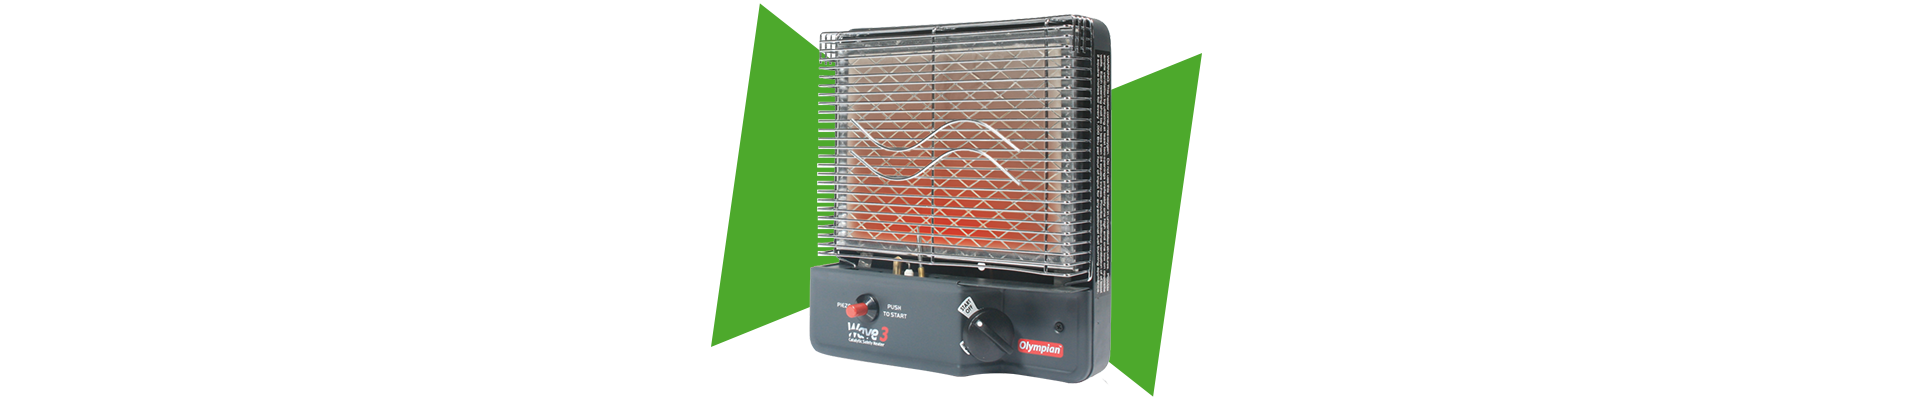 Catalytic heater